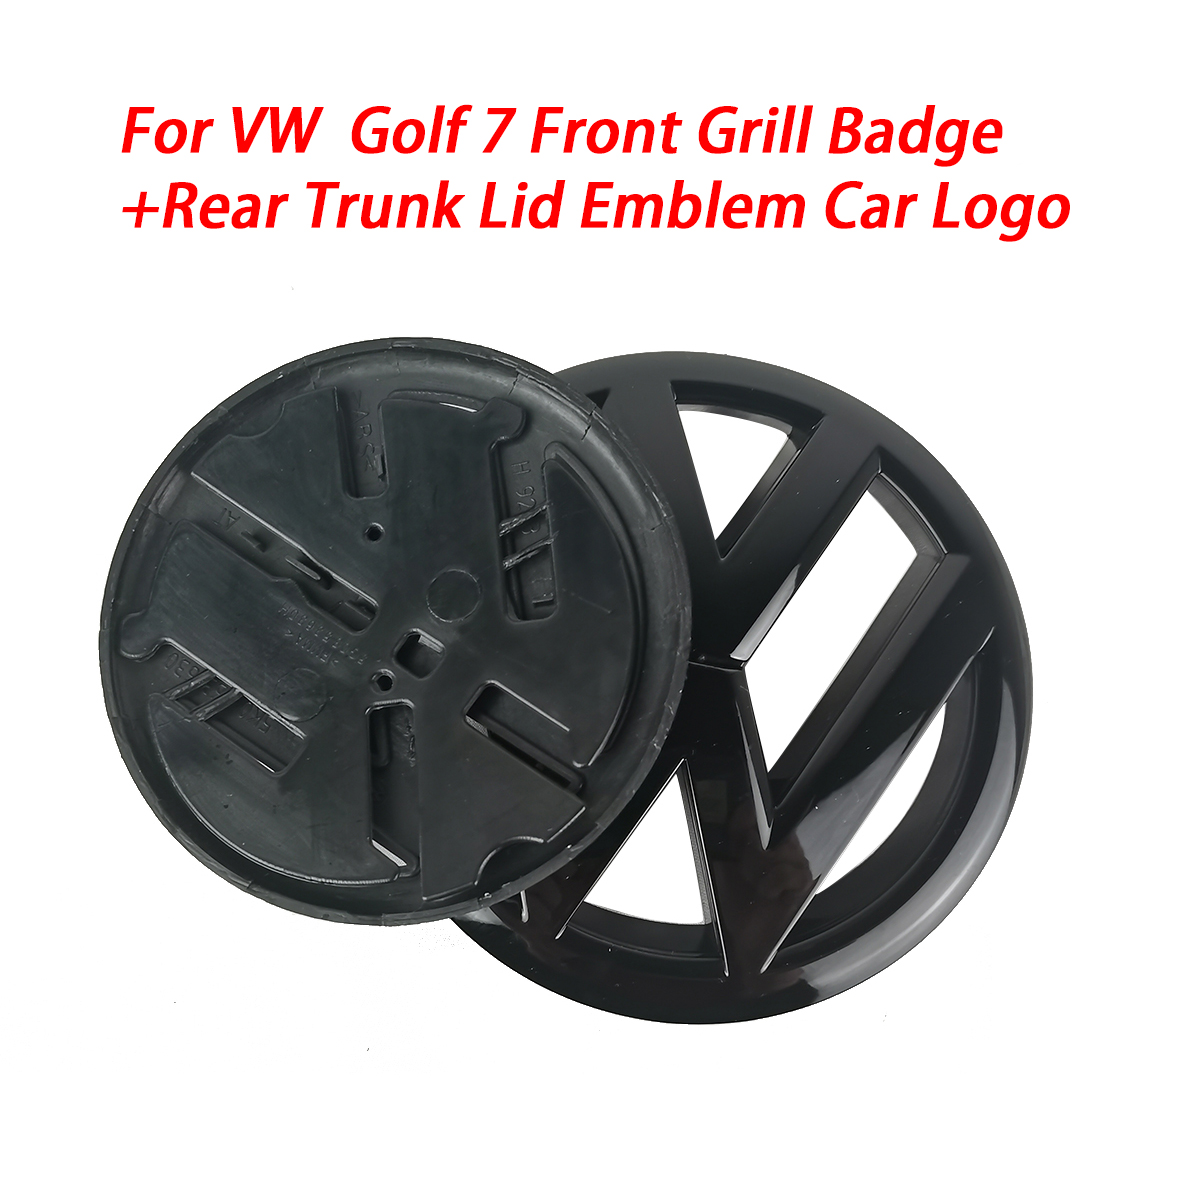 Gloss preto 135mm frente grill distintivo + 110mm tronco traseiro tampa emblema logotipo do carro apto para vw volkswagen golf mk7 todos os modelos 2013-2017